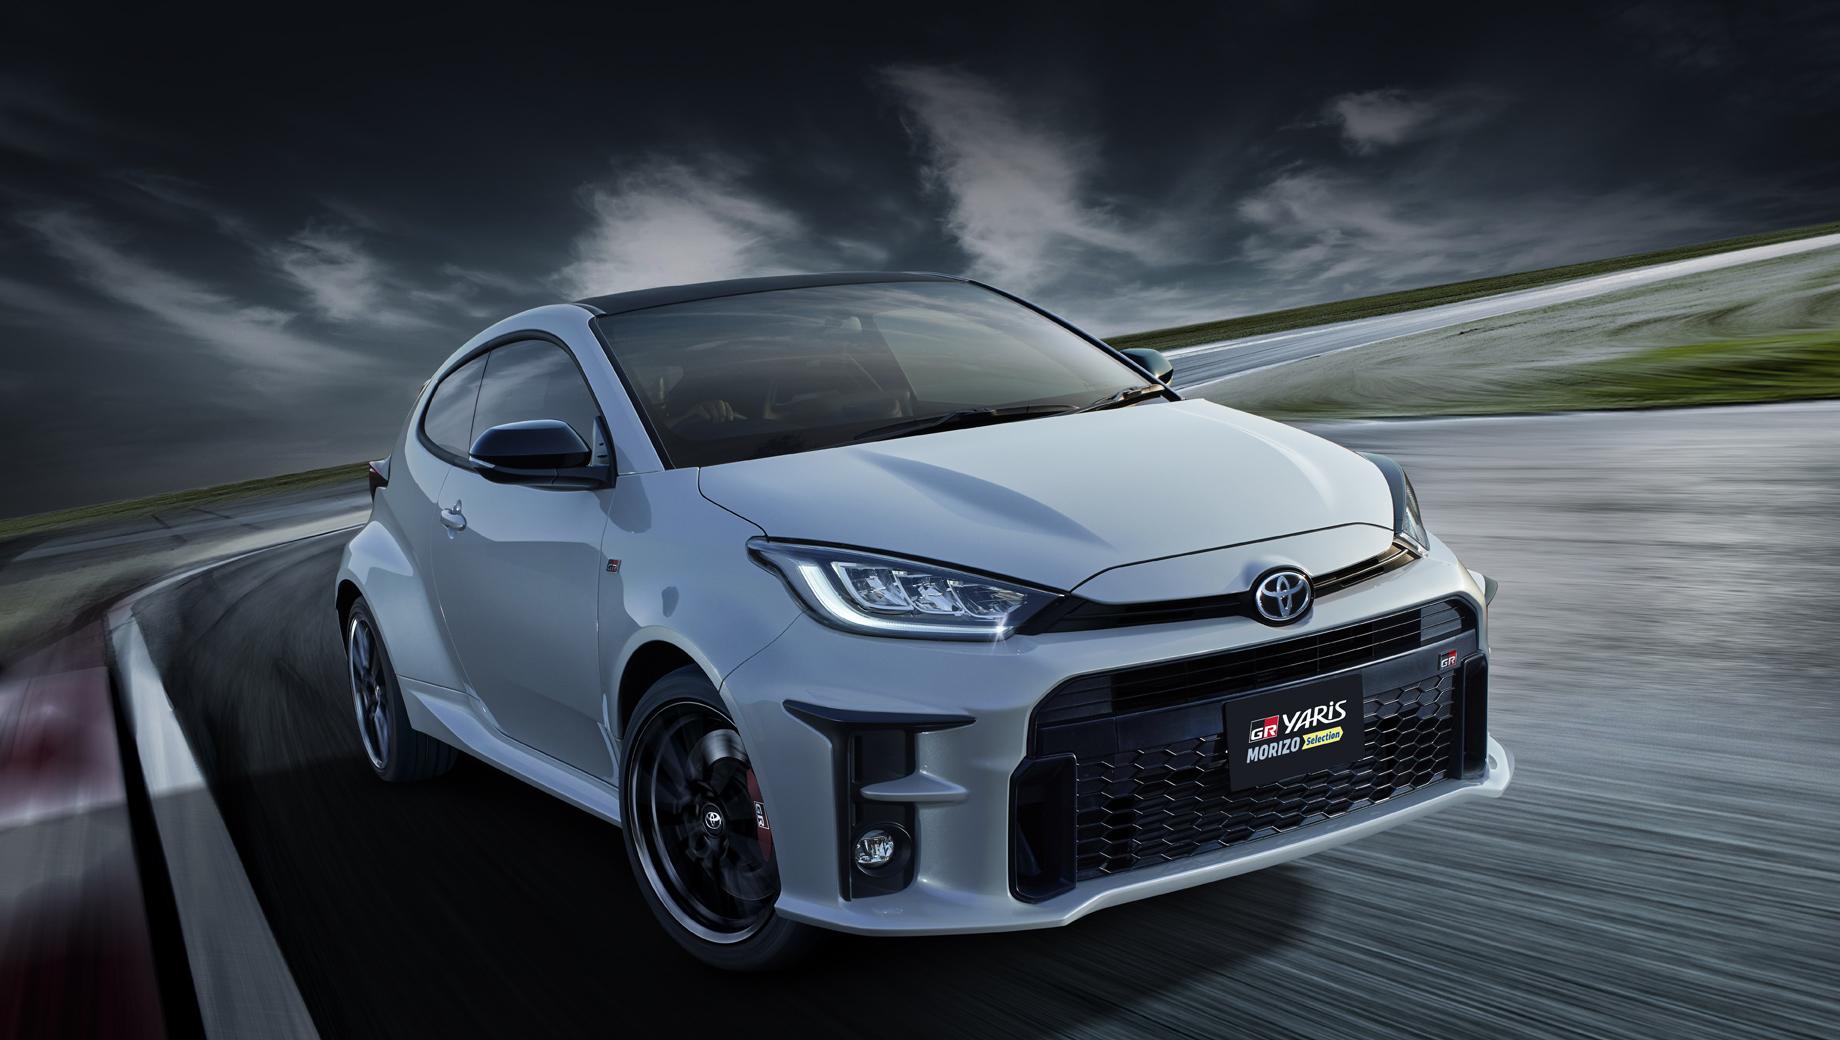 Toyota yaris,Toyota gr yaris. Цвет кузова можно выбрать из трёх вариантов: Platinum White Pearl Mica, Emotional Red II и Precious Black Pearl.